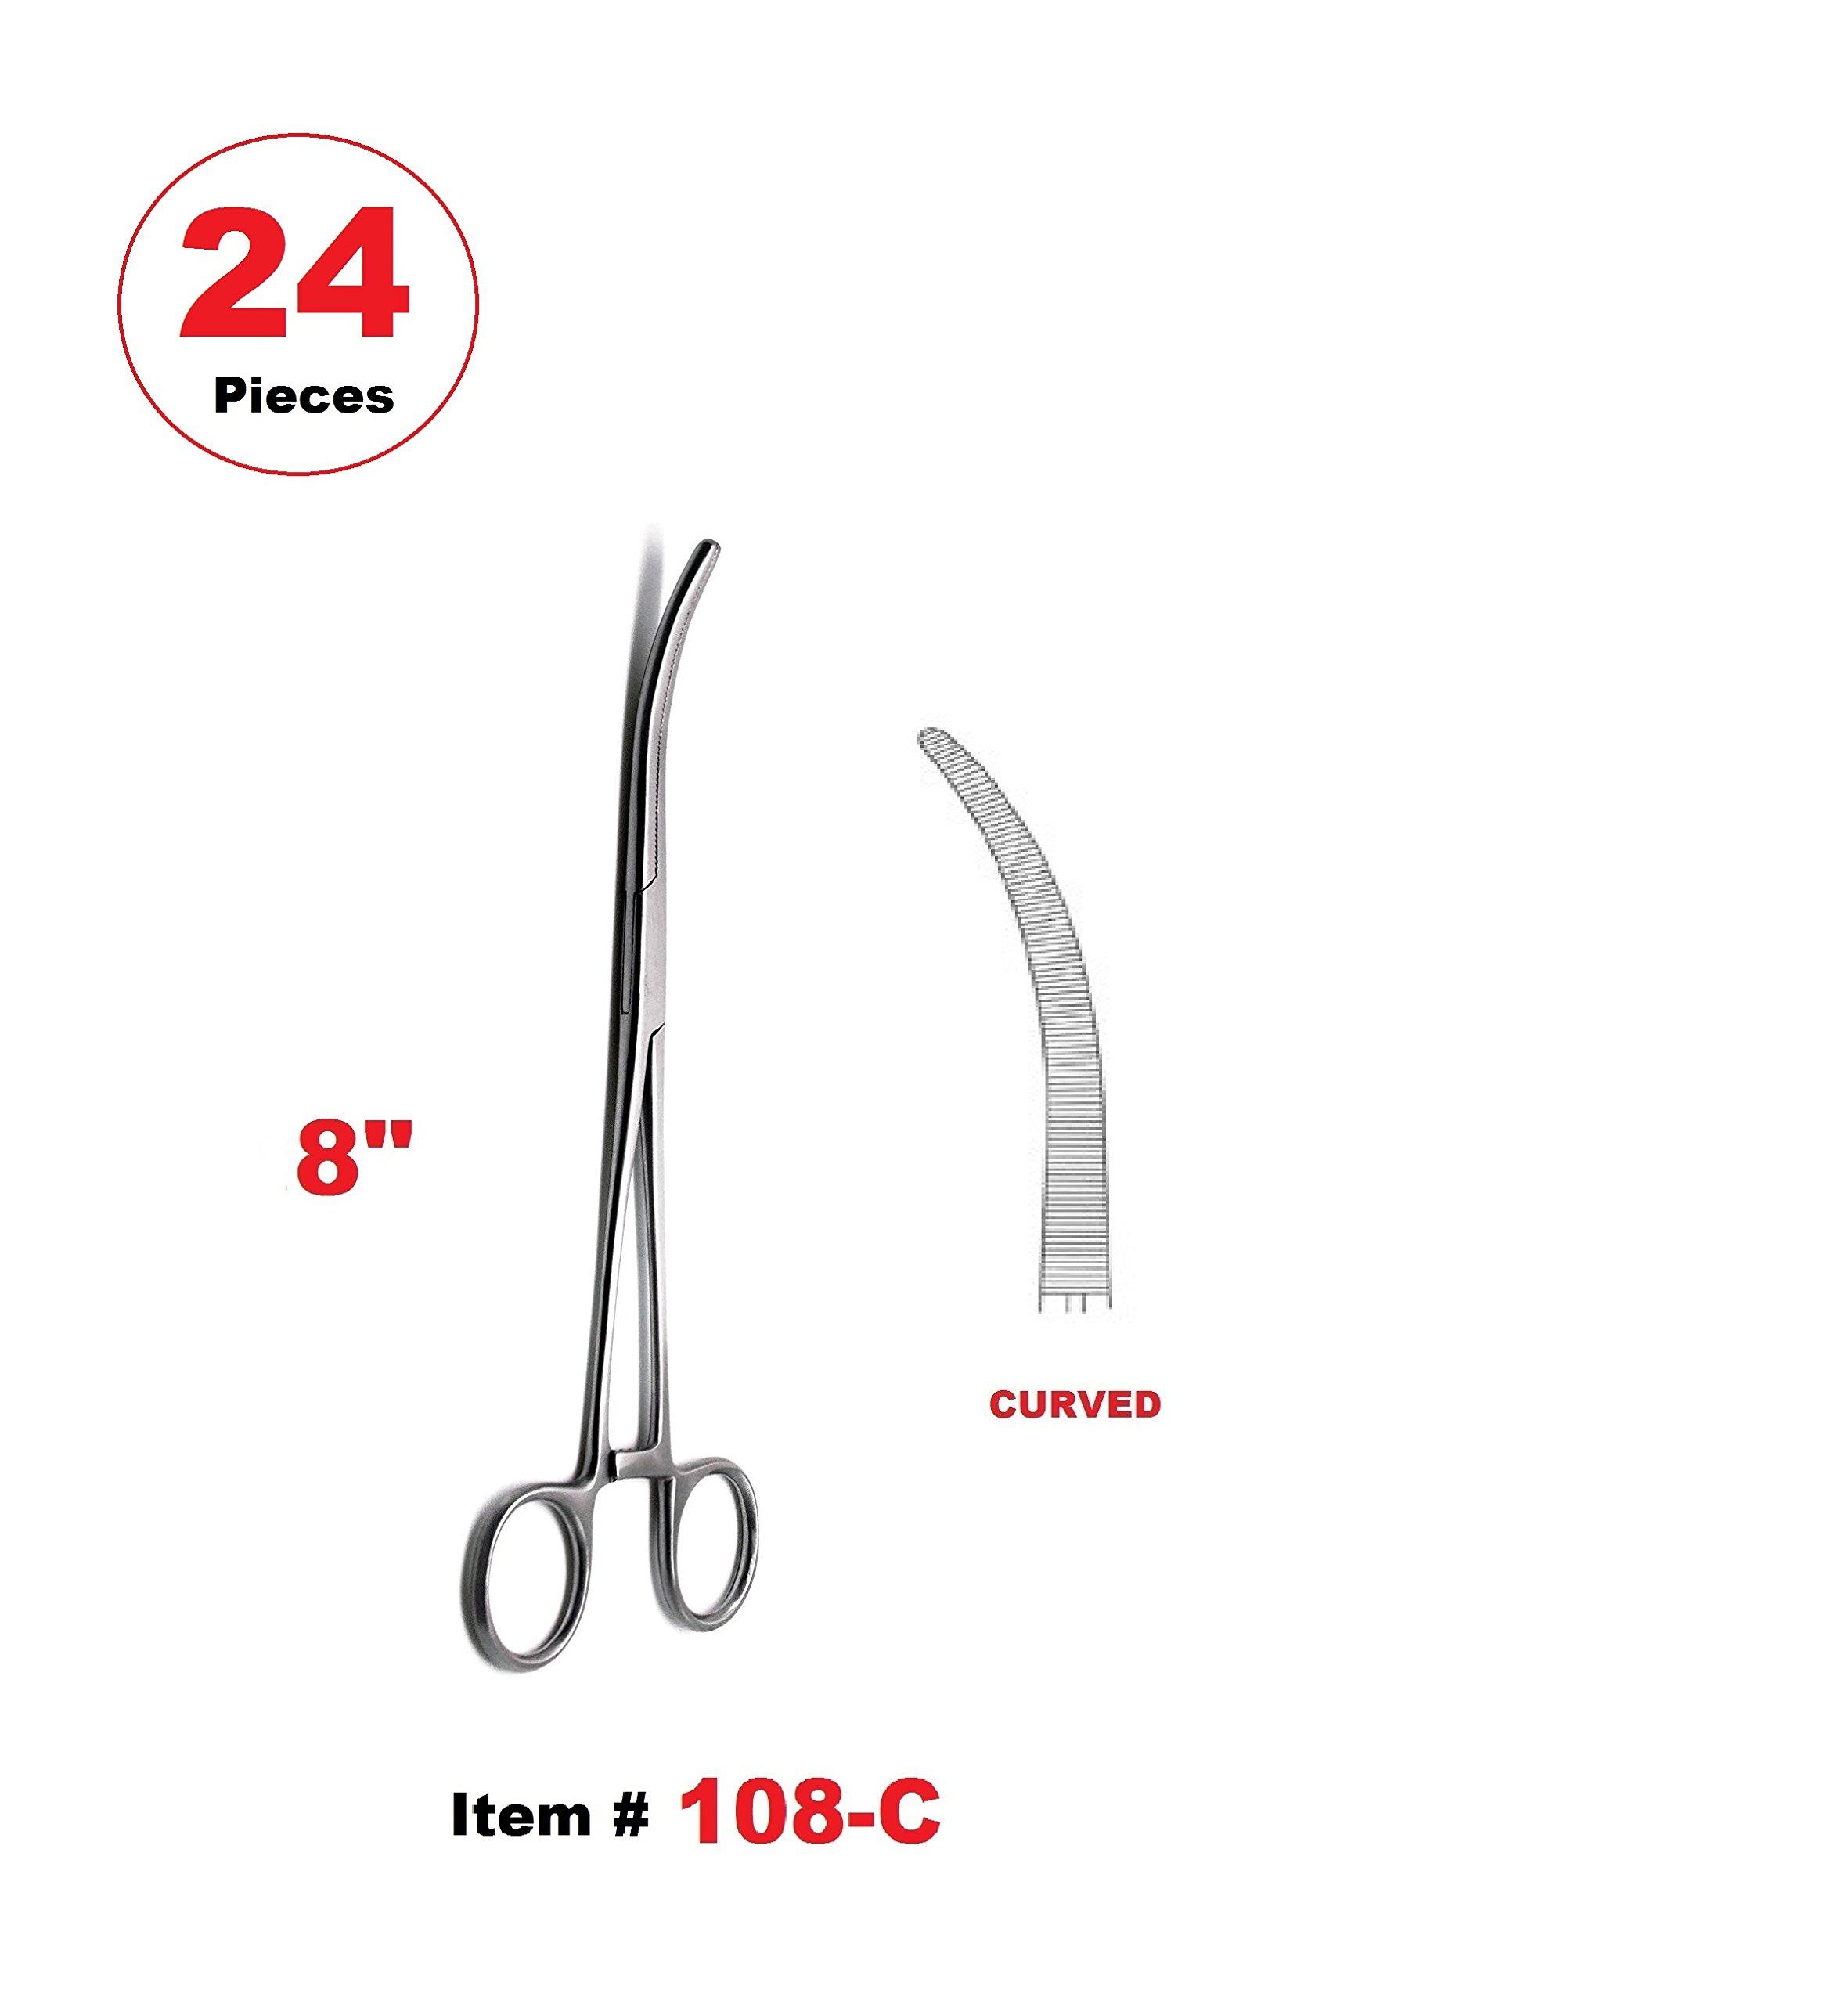 24 Pcs 8'' Pean Hemostat Locking Forceps Curved